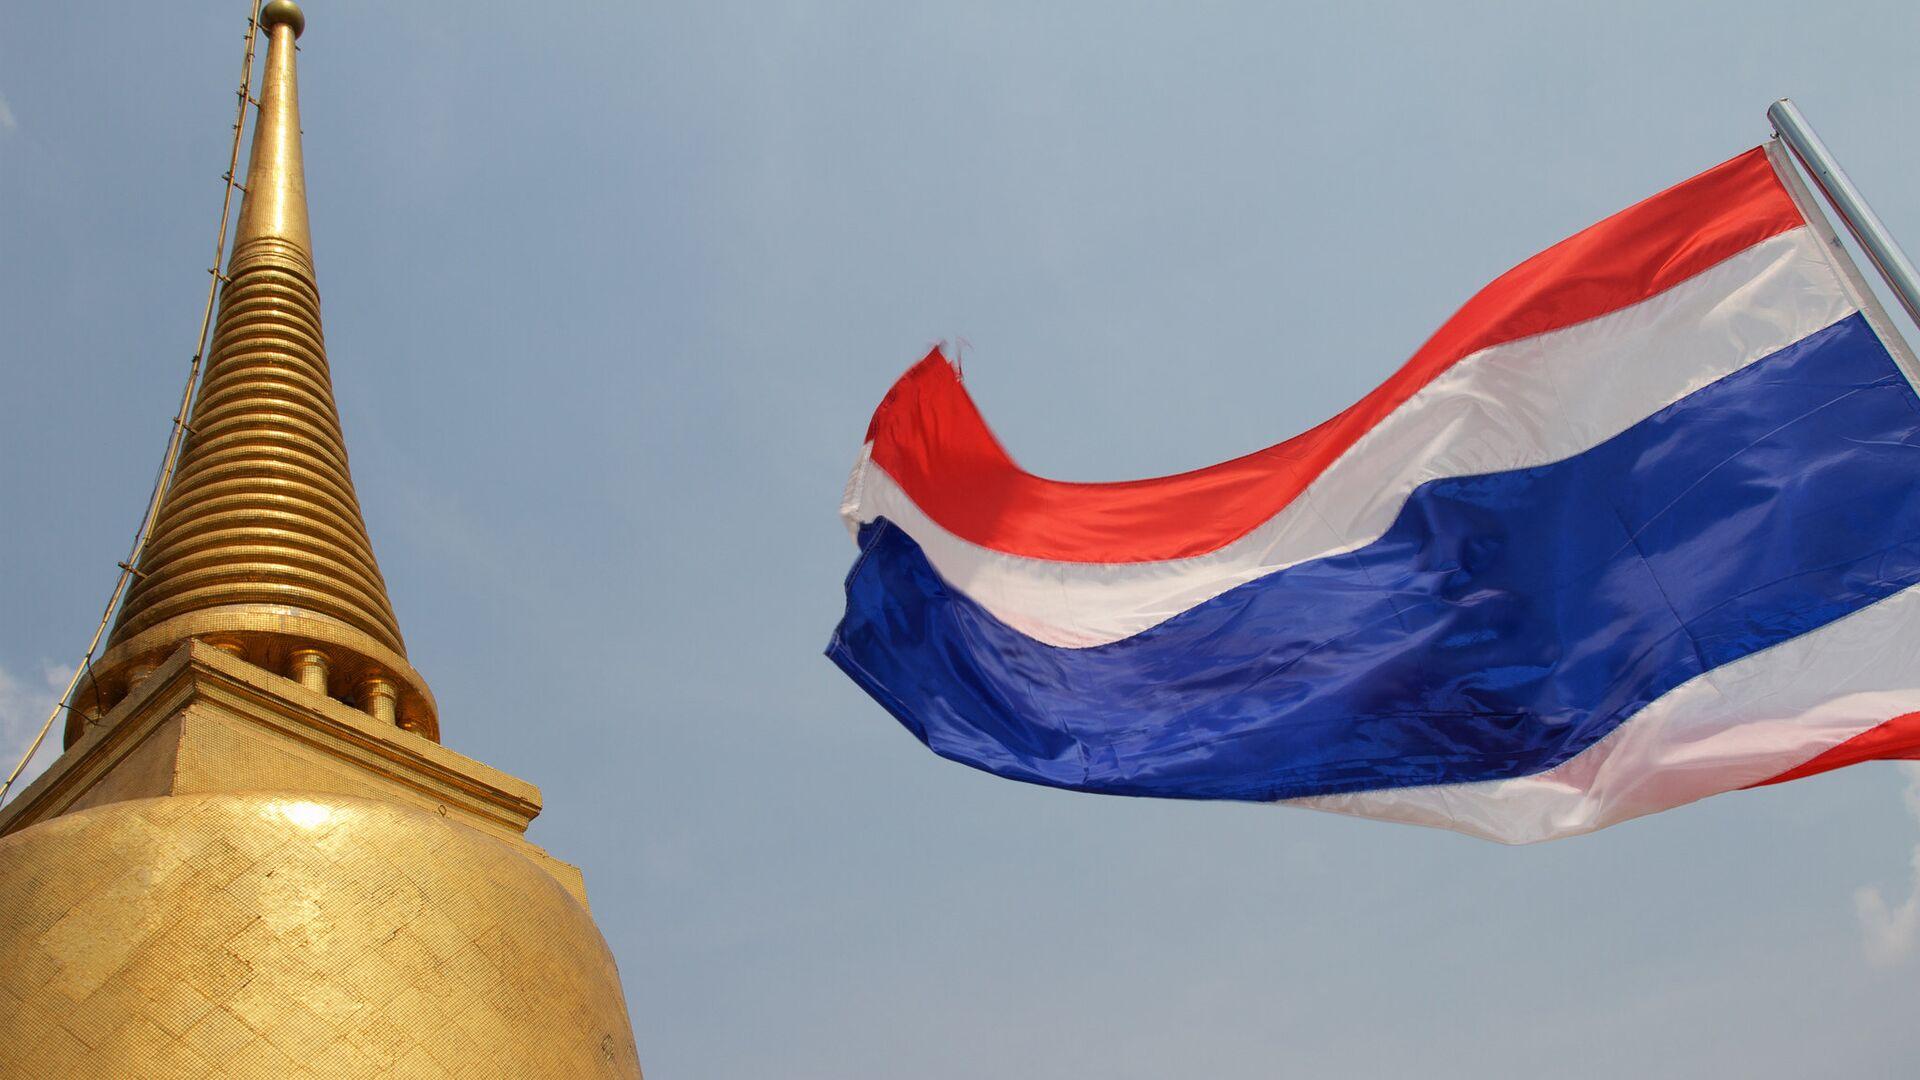 Quốc kỳ Thái Lan - Sputnik Việt Nam, 1920, 24.09.2021